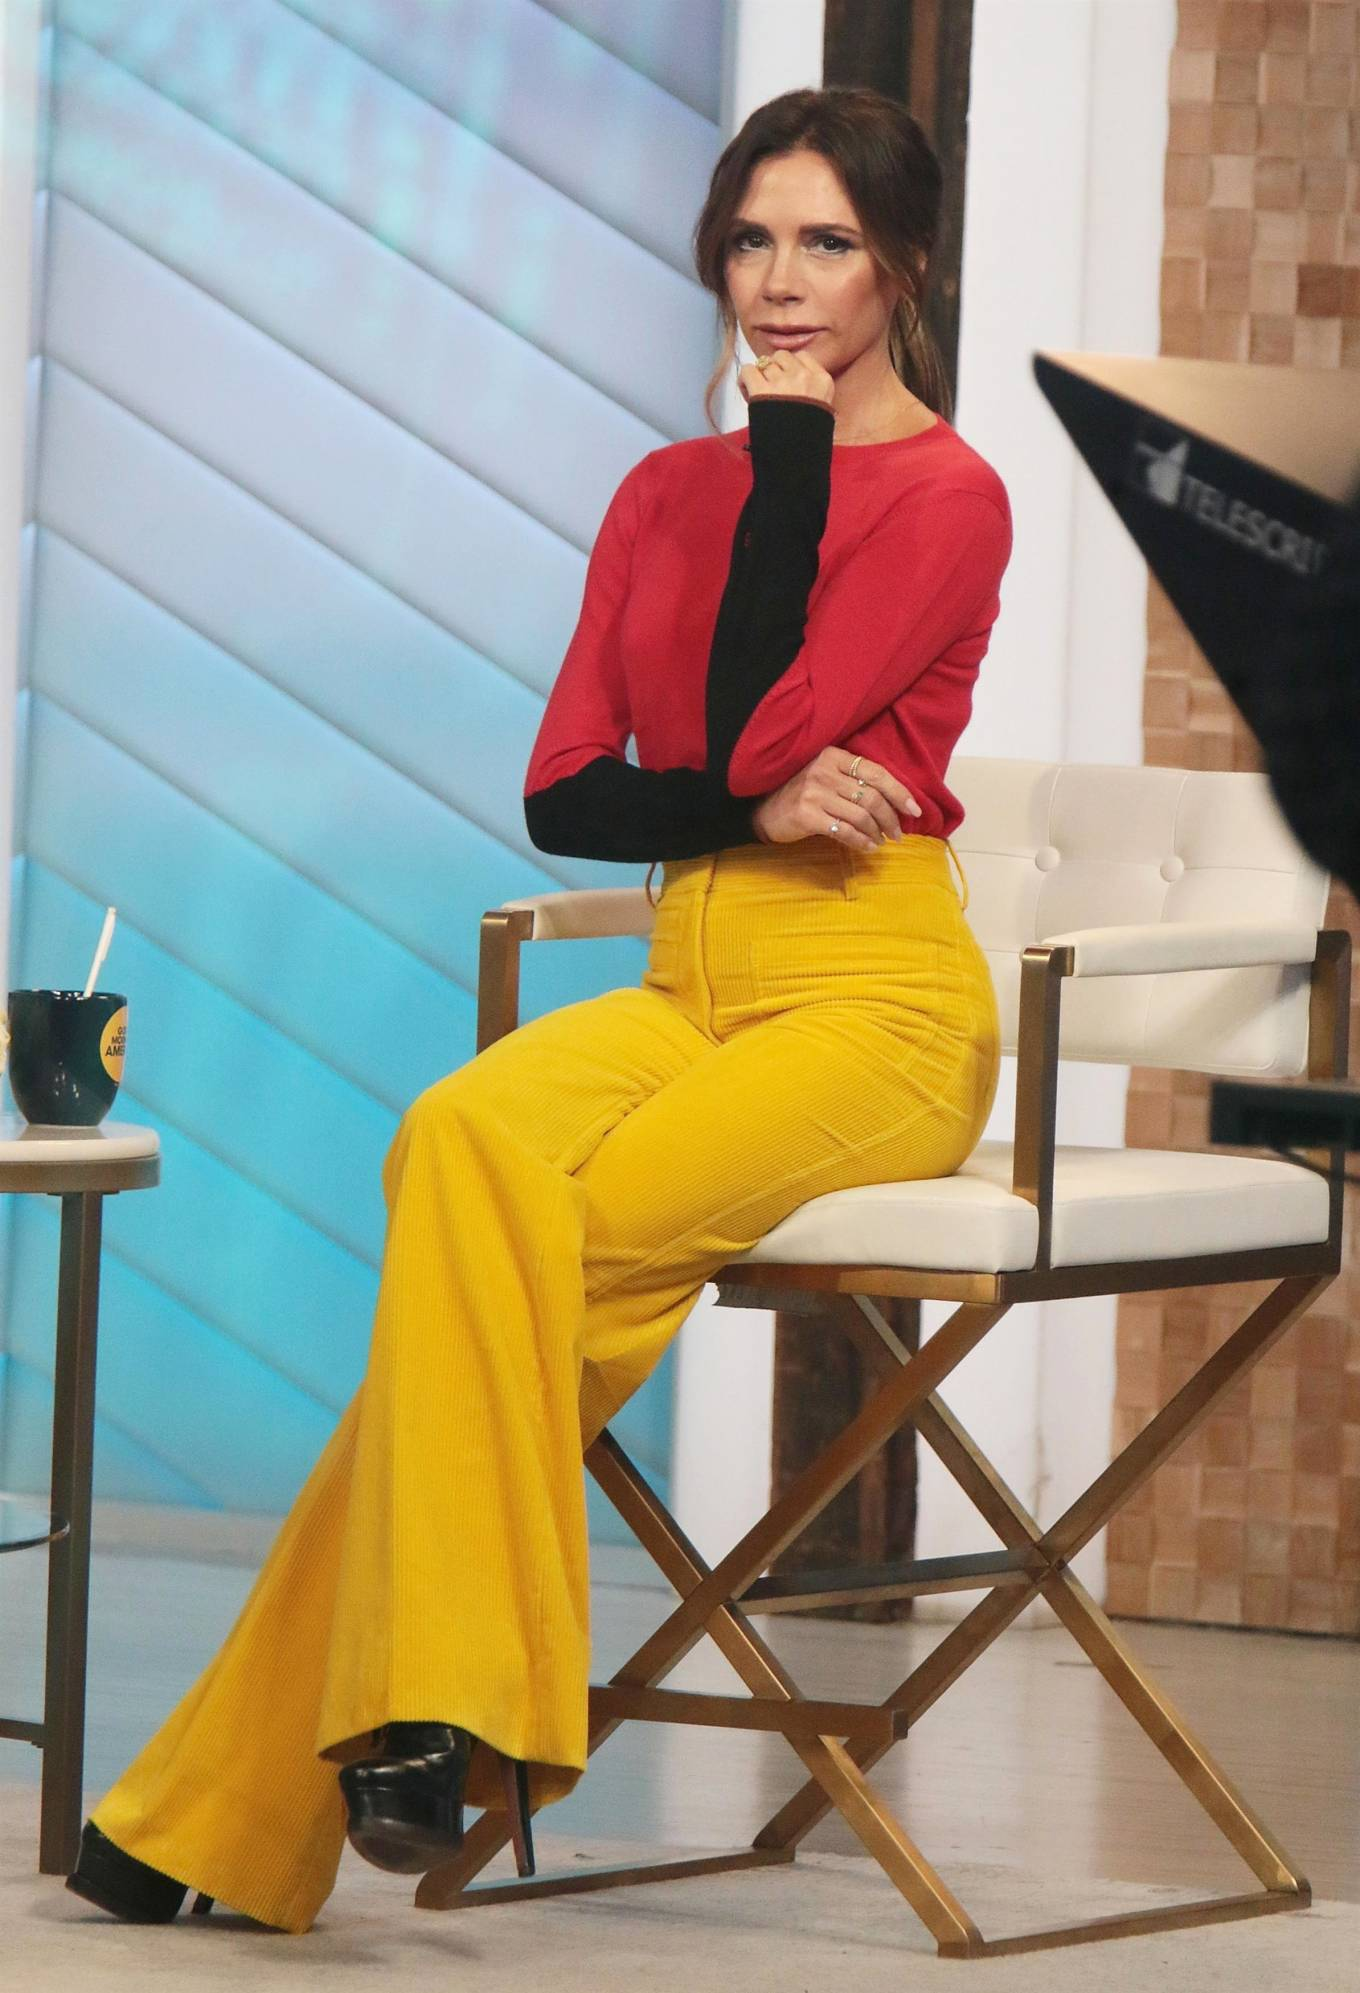 Victoria Beckham 2021 : Victoria Beckham – on Good Morning America promoting her new designer clothing in New York City-15